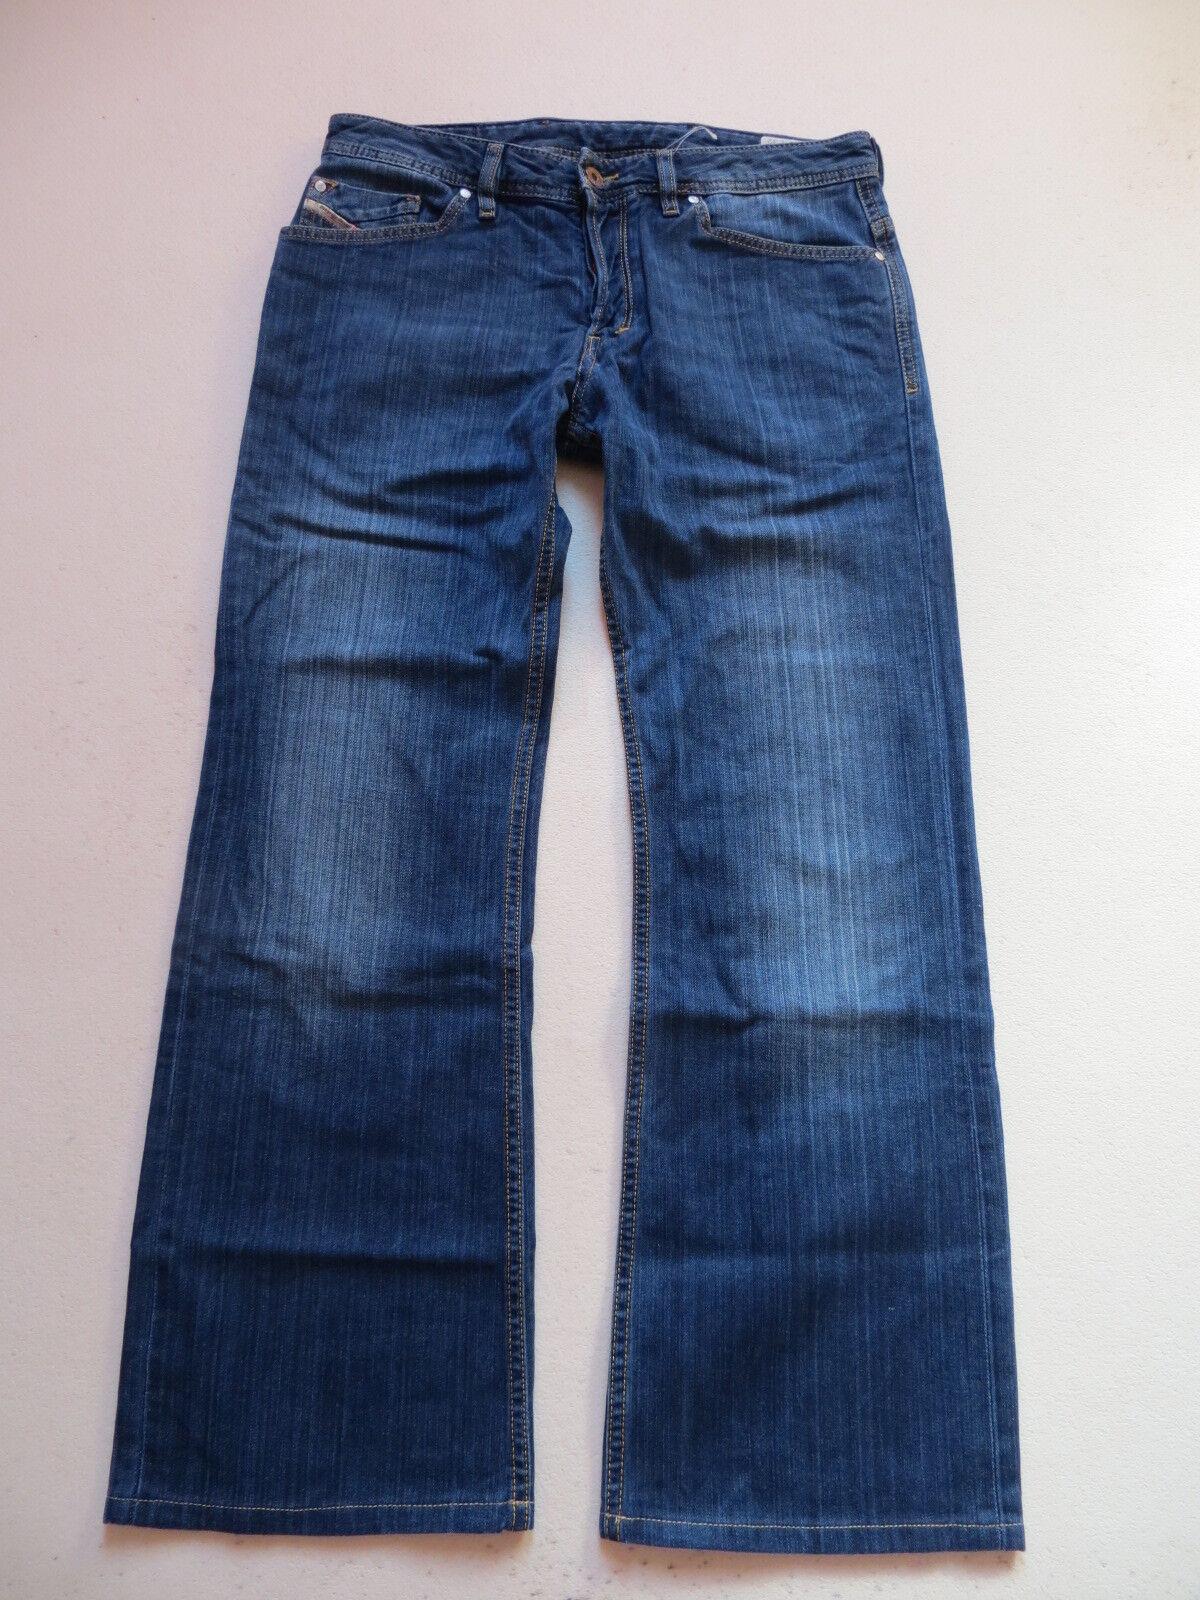 Diesel ZAGHOR wash 008RS Stiefelcut Jeans Hose W 31  L 30 Wide Leg Vintage Denim